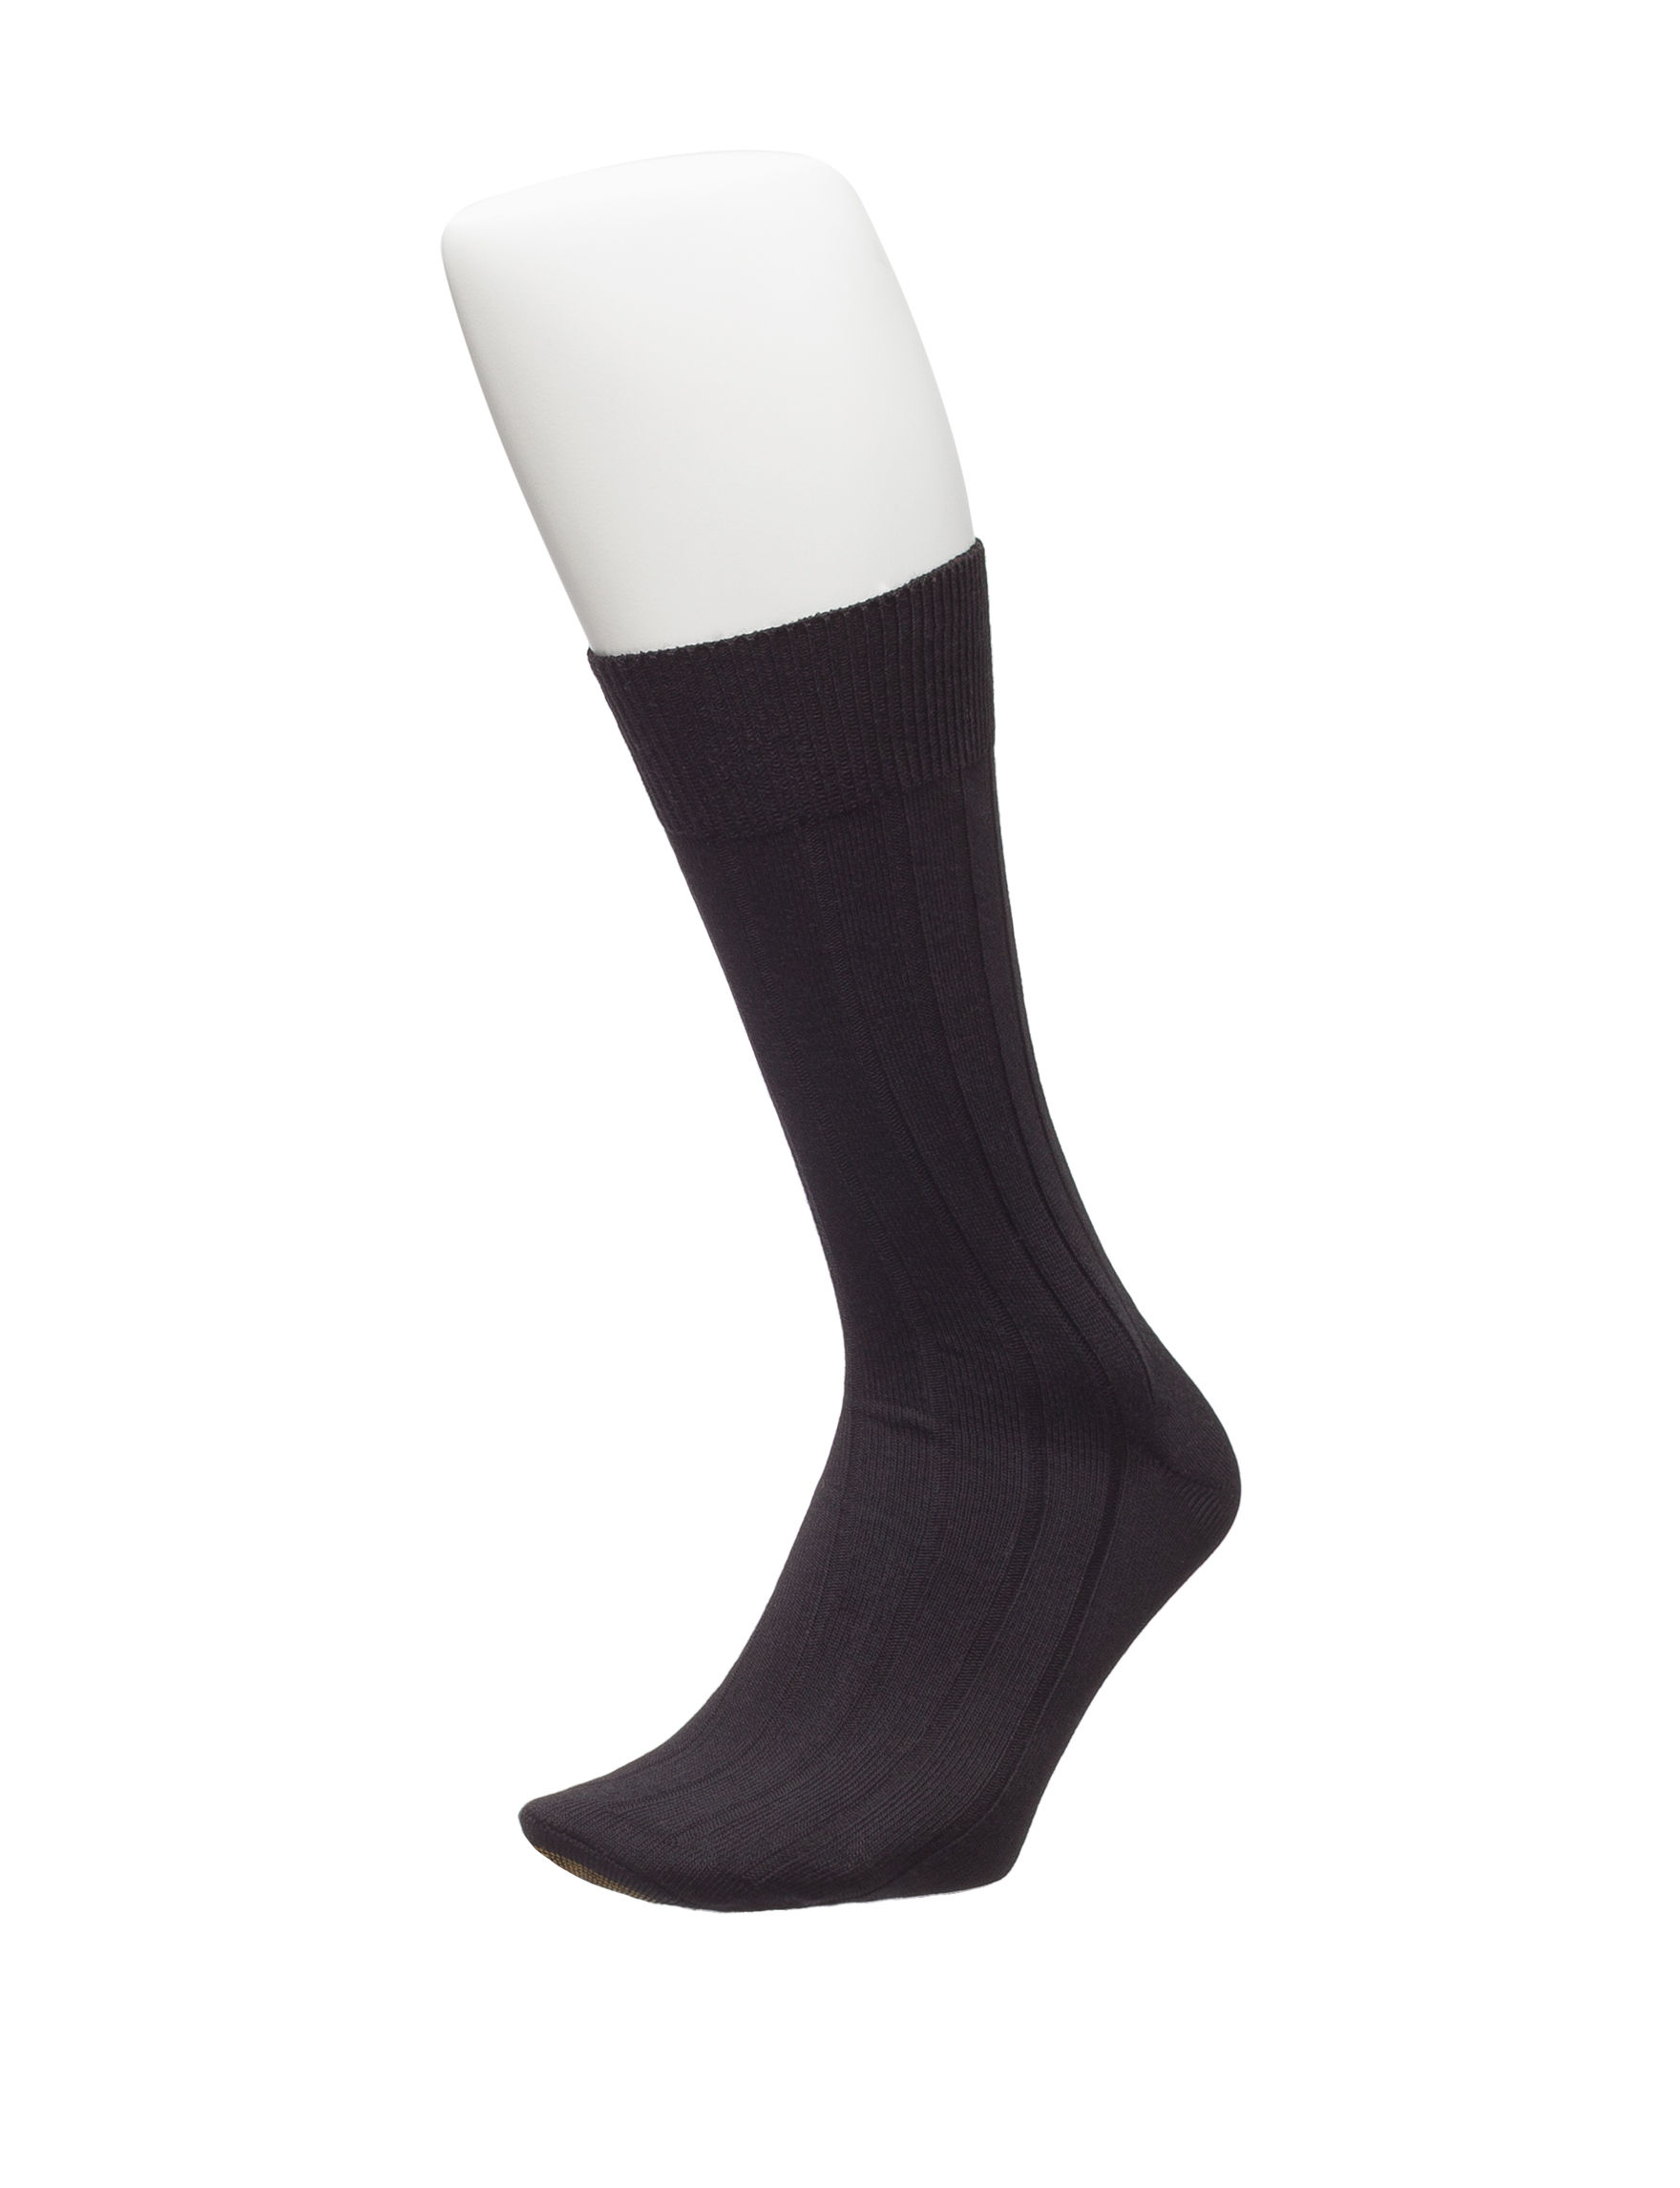 Gold Toe Black Socks